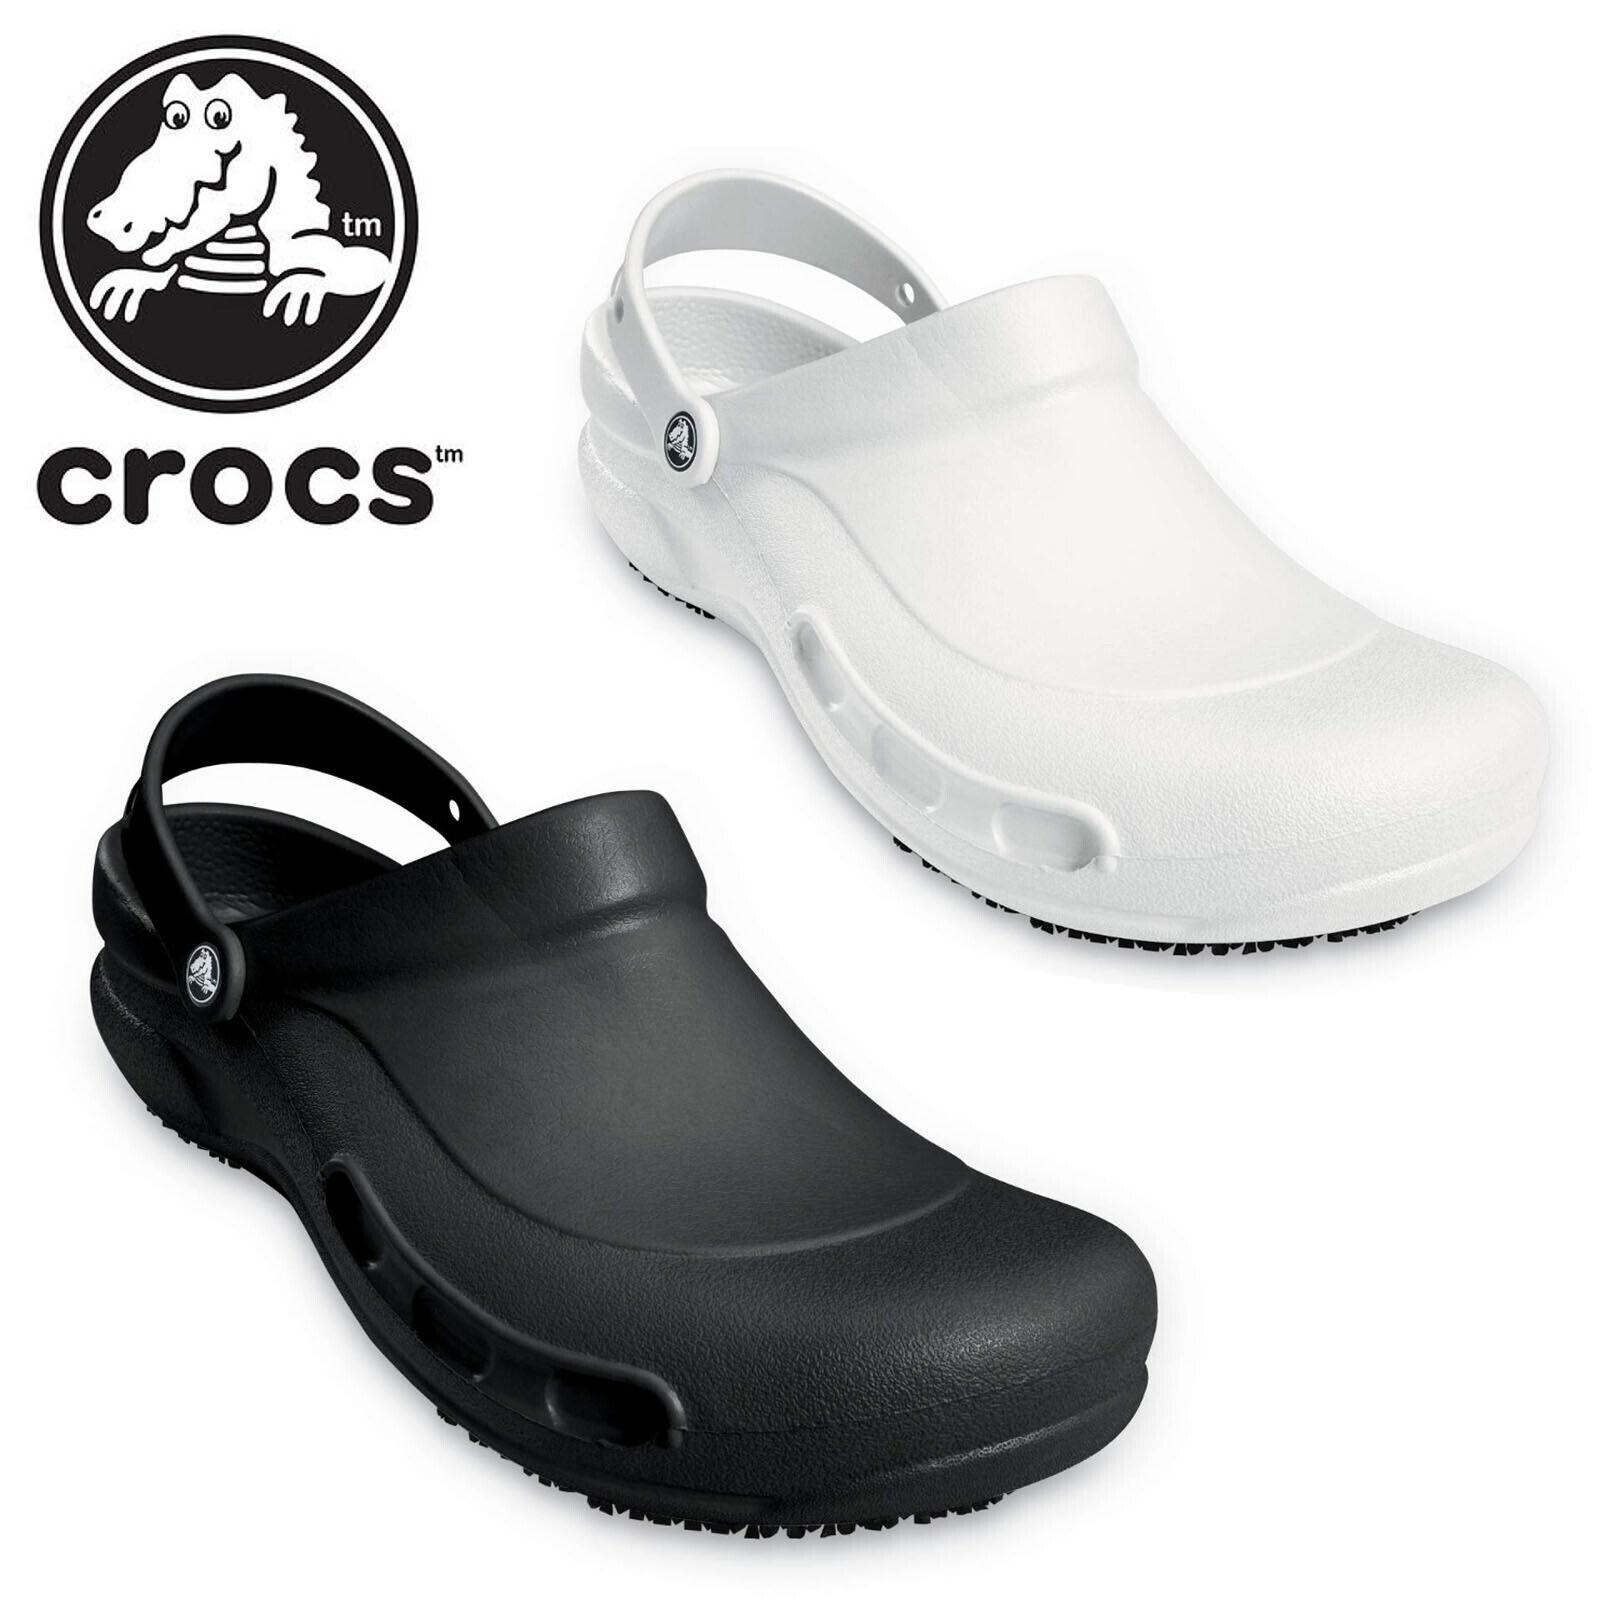 Crocs Bistro Kitchen Clogs Comfort Work